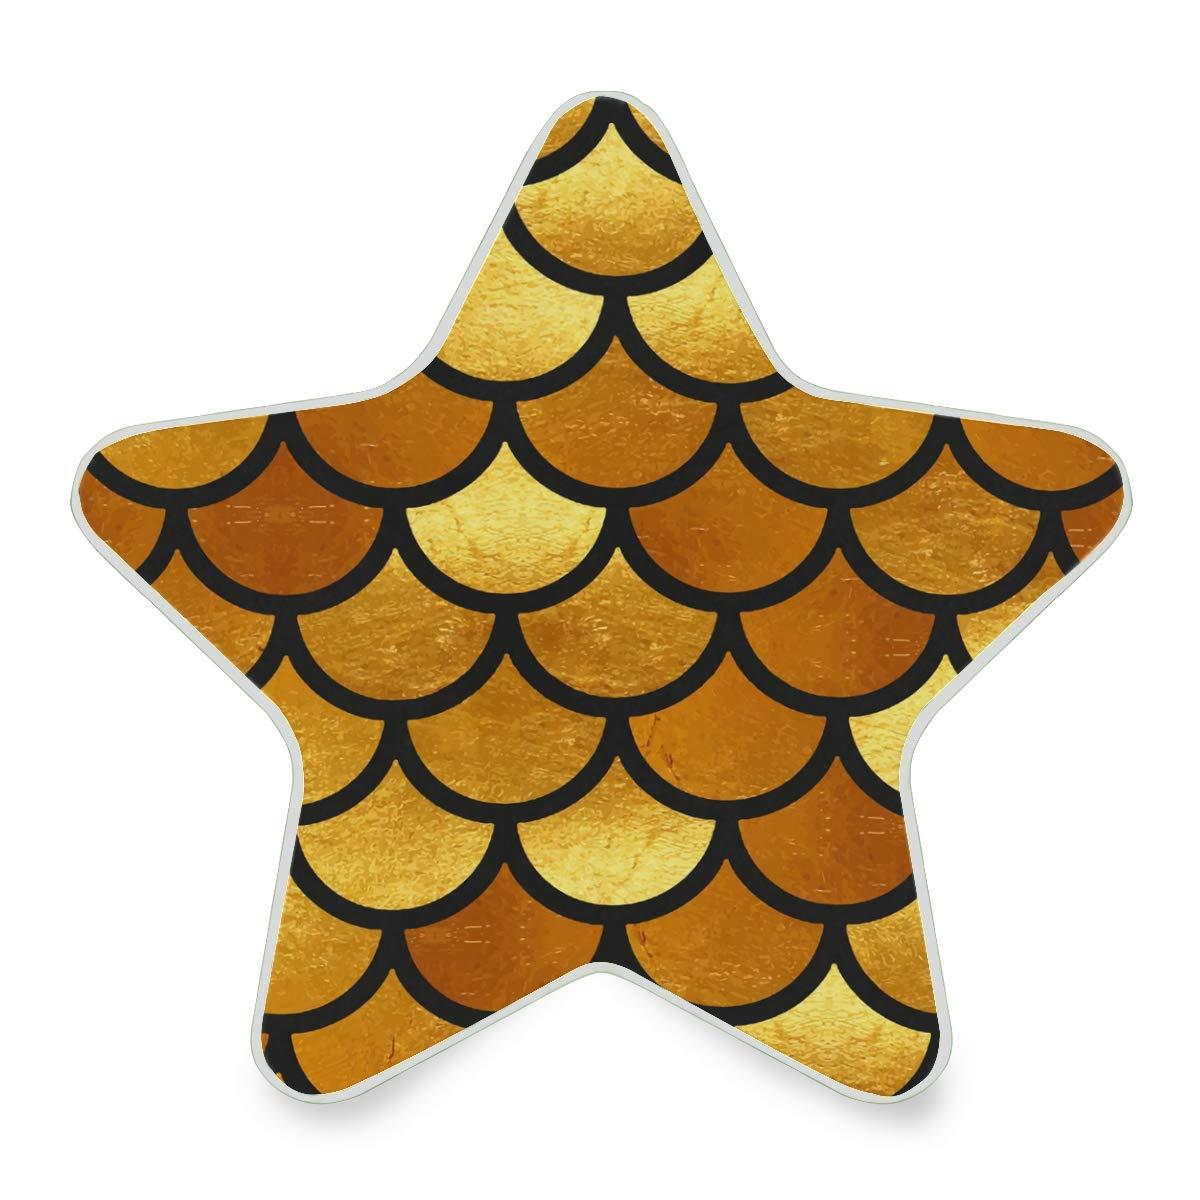 Linomo Star Shaped LED Night Light Lamp Gold Golden Fish Mermaid Scales Auto Senor Nightlight Plug in for Kids Adults Boys Girls Bedroom Decor